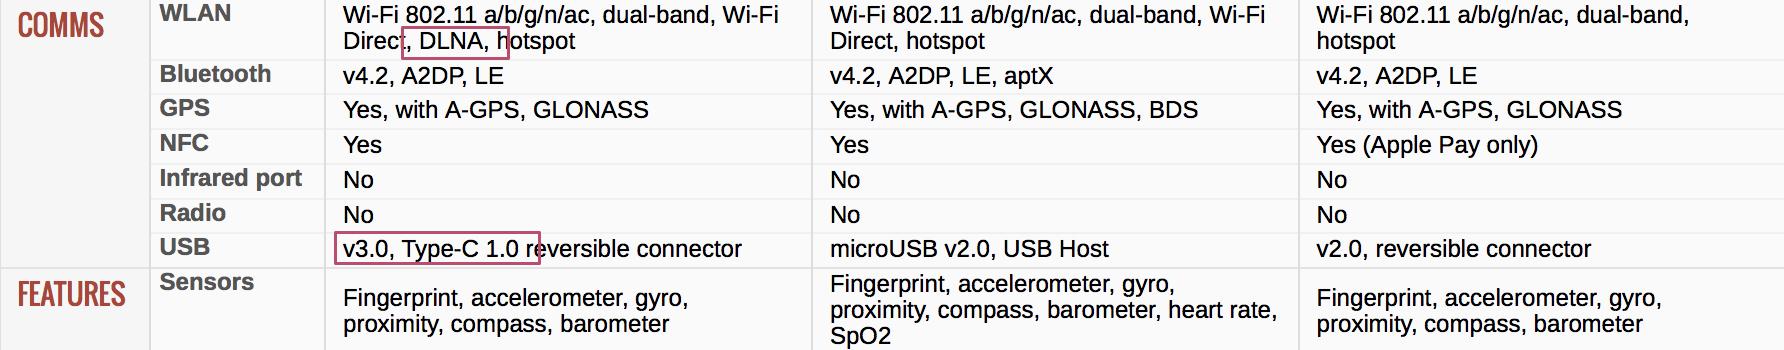 google-pixel-review-technical-specifications-comparison-pixel-vs-samsung-s7-vs-iphone-7-page-3